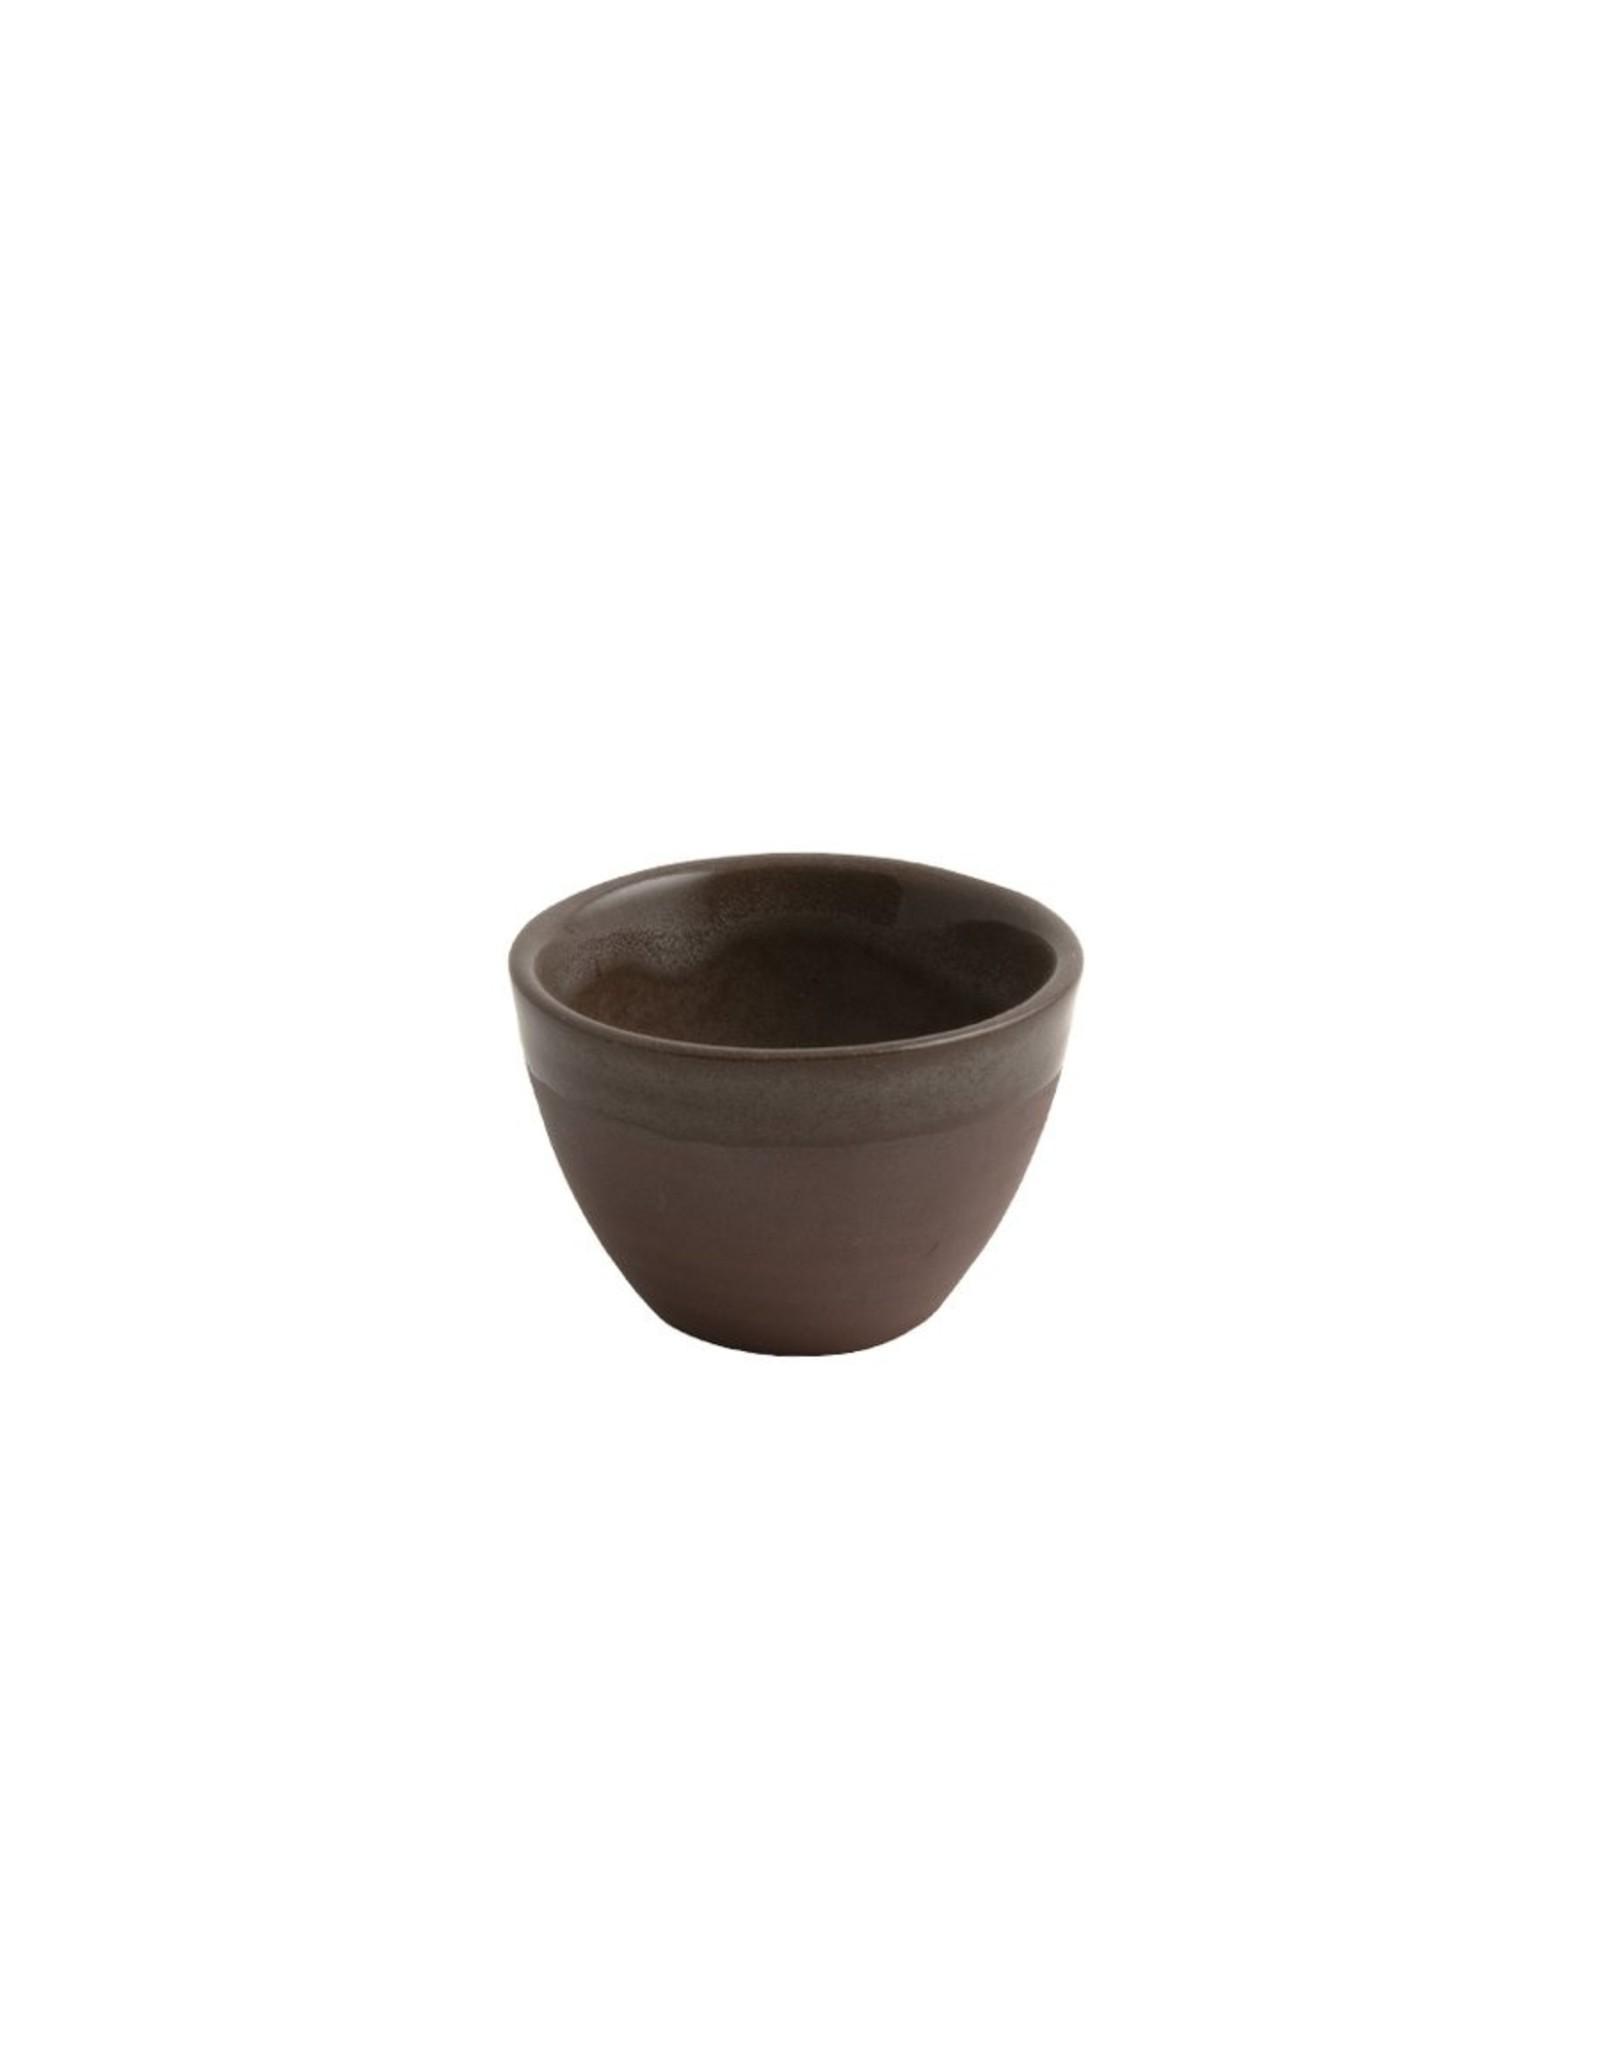 Yann cup L - Earth